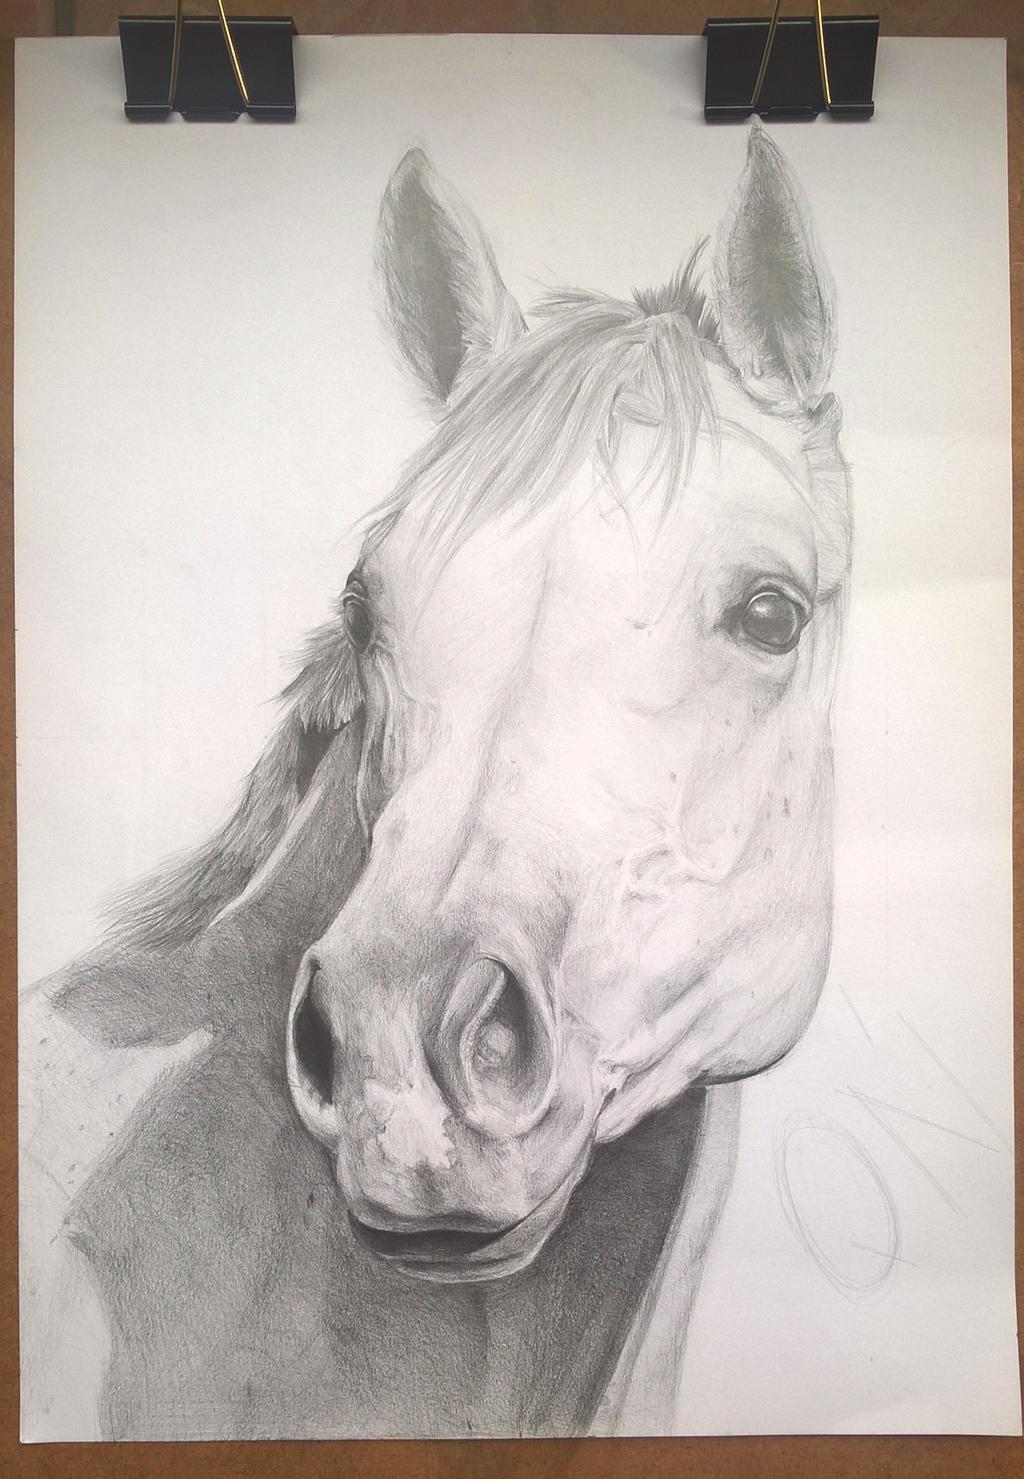 horse wip by Eshaerg